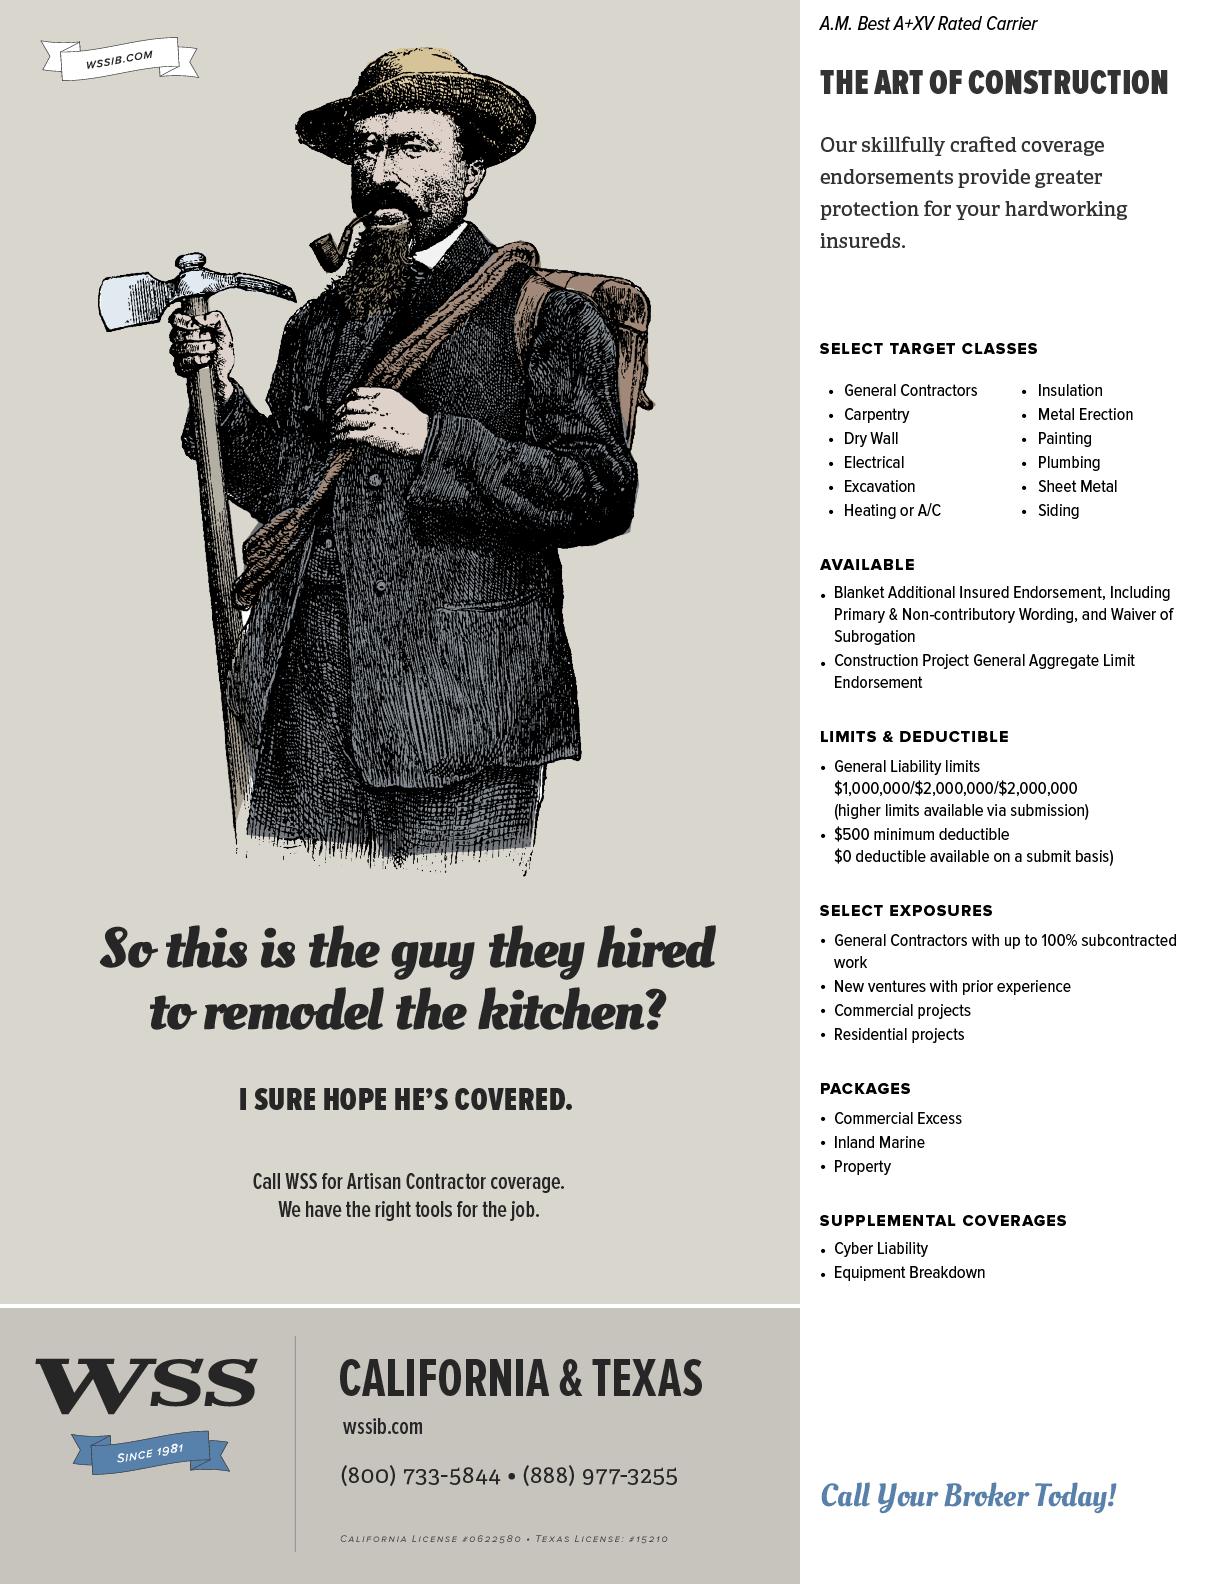 WSS-Flyer-ArtisanContractors.png